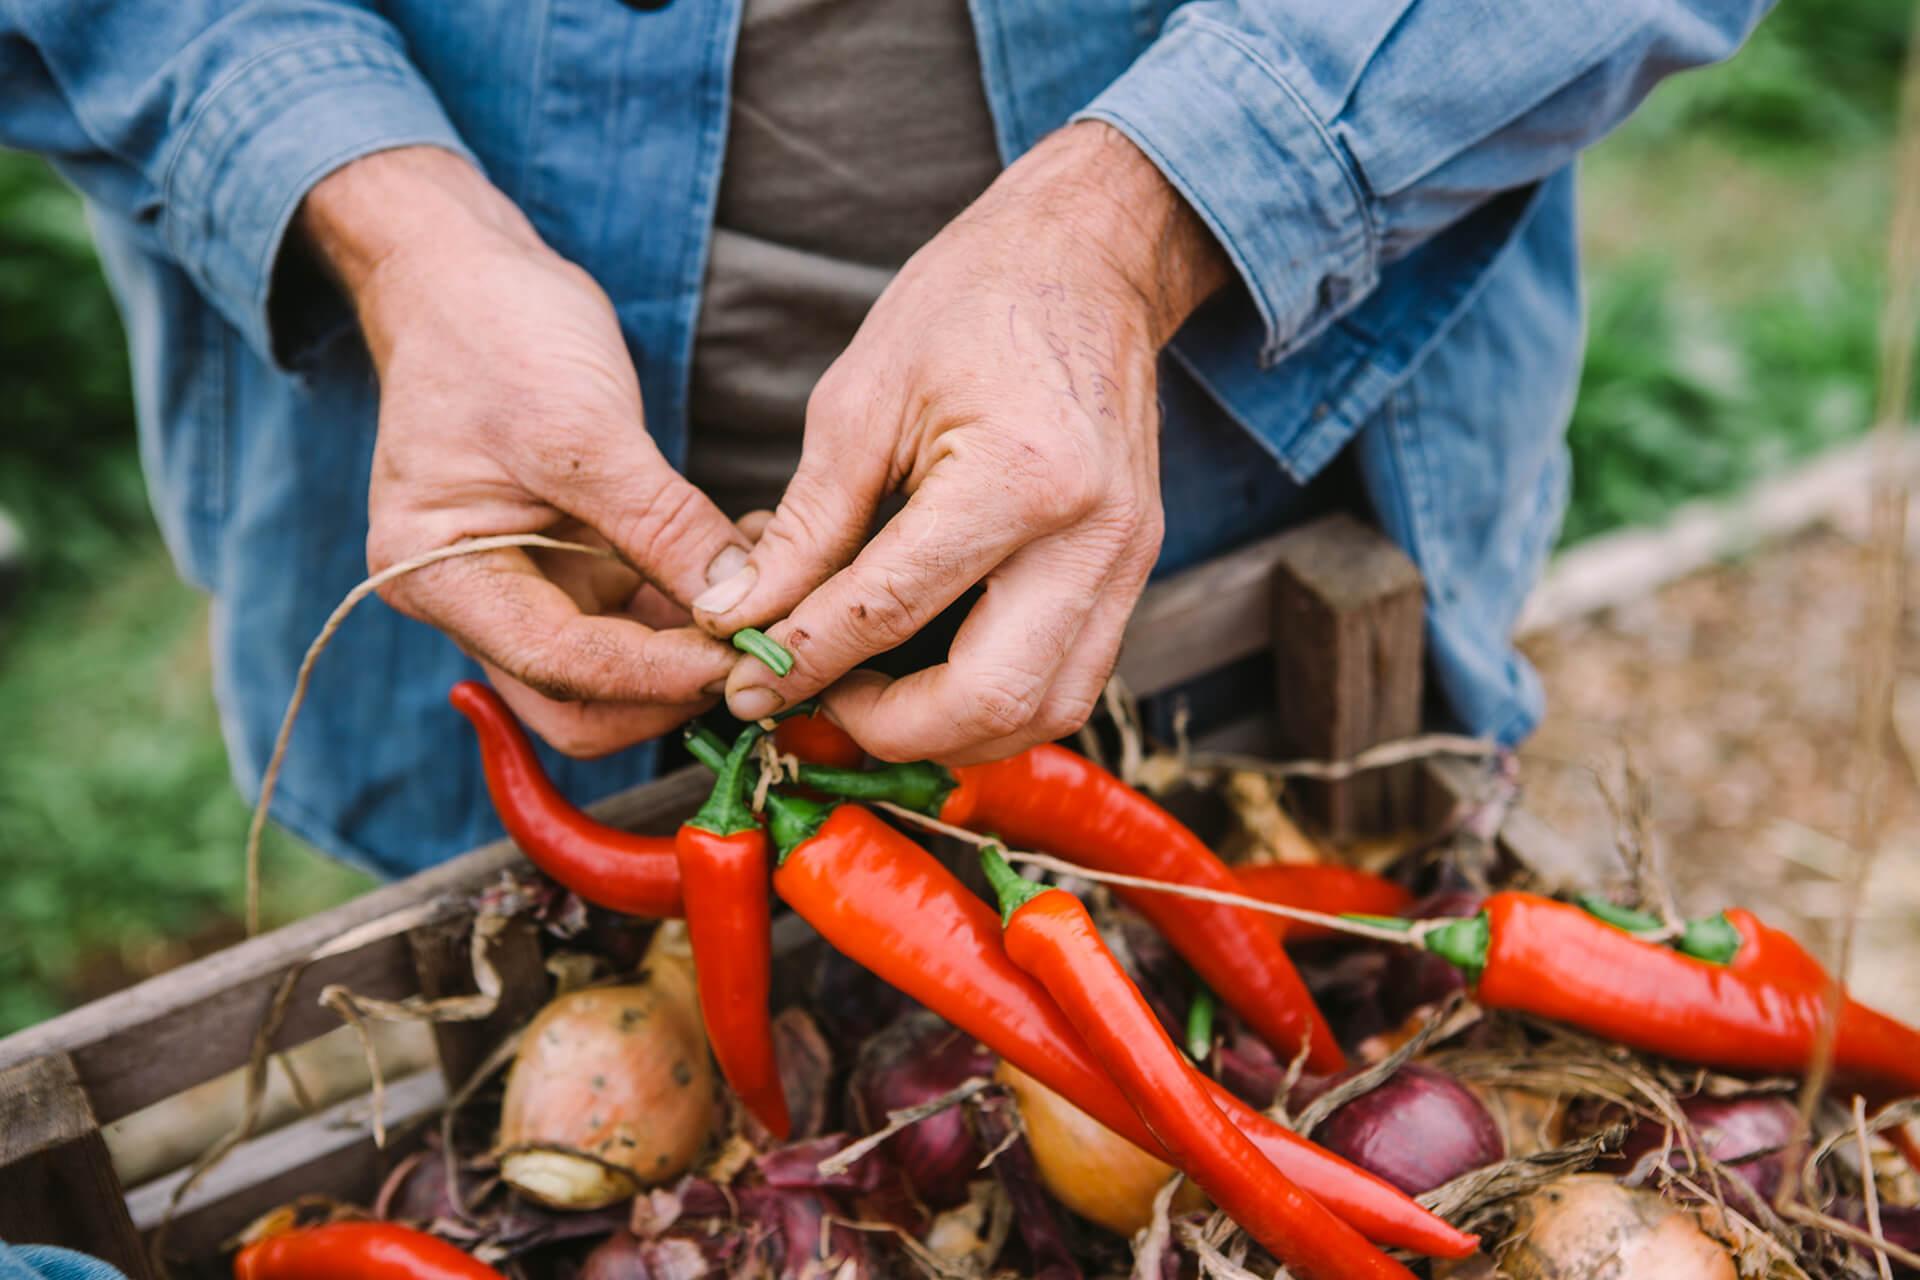 Organic, Growing, Daylesford, Photography, Film, Garden, WeAreShuffle, Agency, Farmer, Jez Taylor, Chilli, Organic Growing